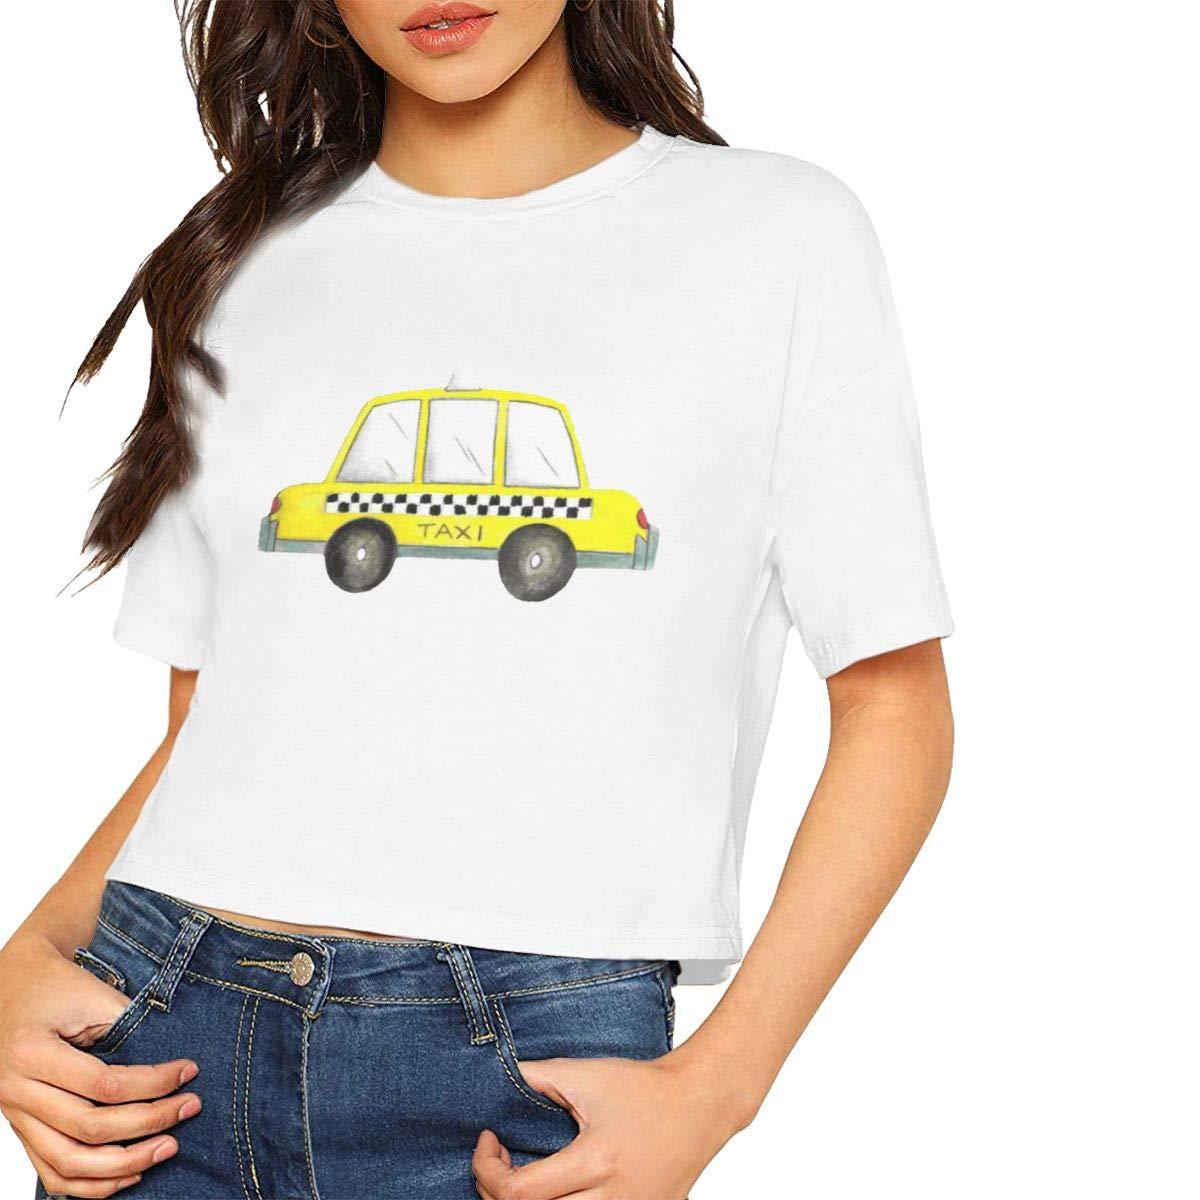 Seuriamin Taxi NYC Yellow New York City Checkered Cab Car Women Fashion Short Sleeve Leak Navel Crew Neck T-Shirts